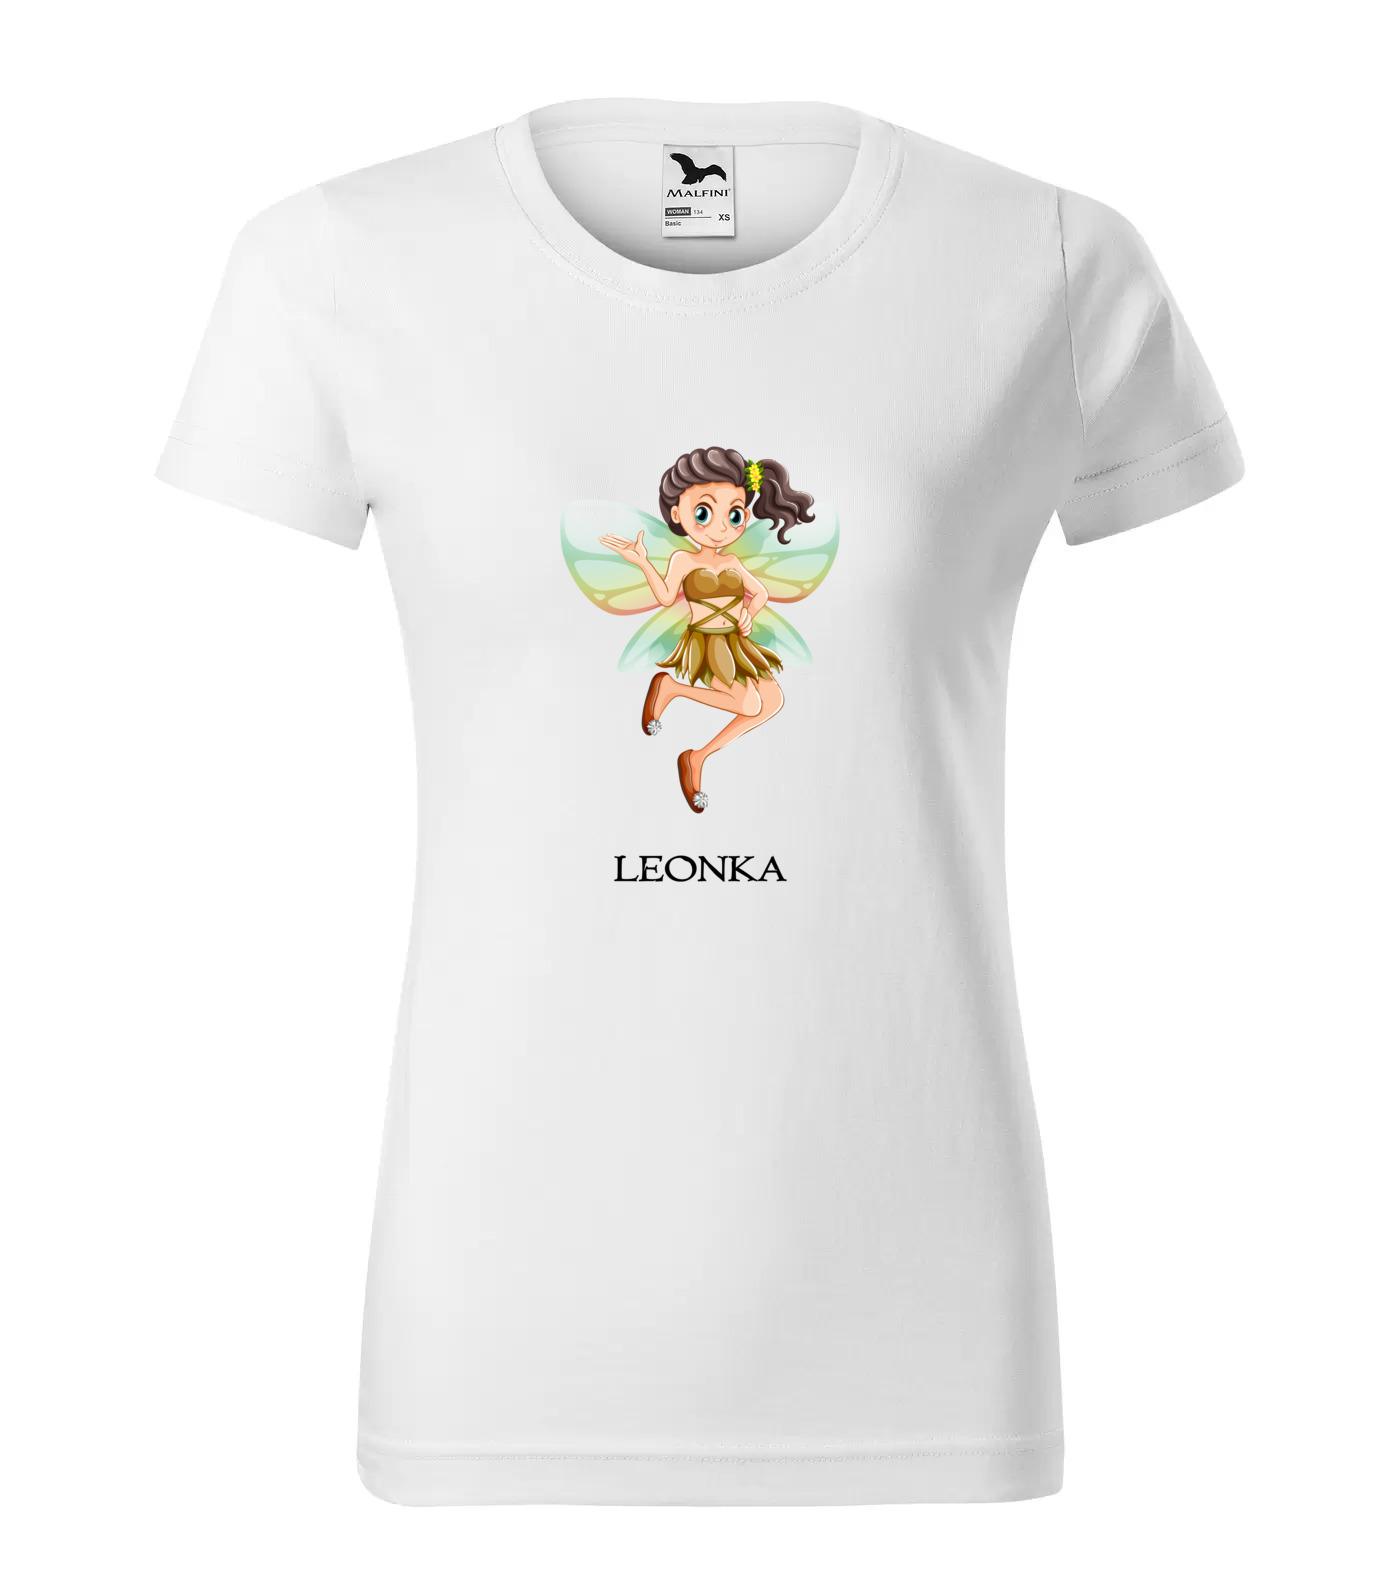 Tričko Víla Leonka